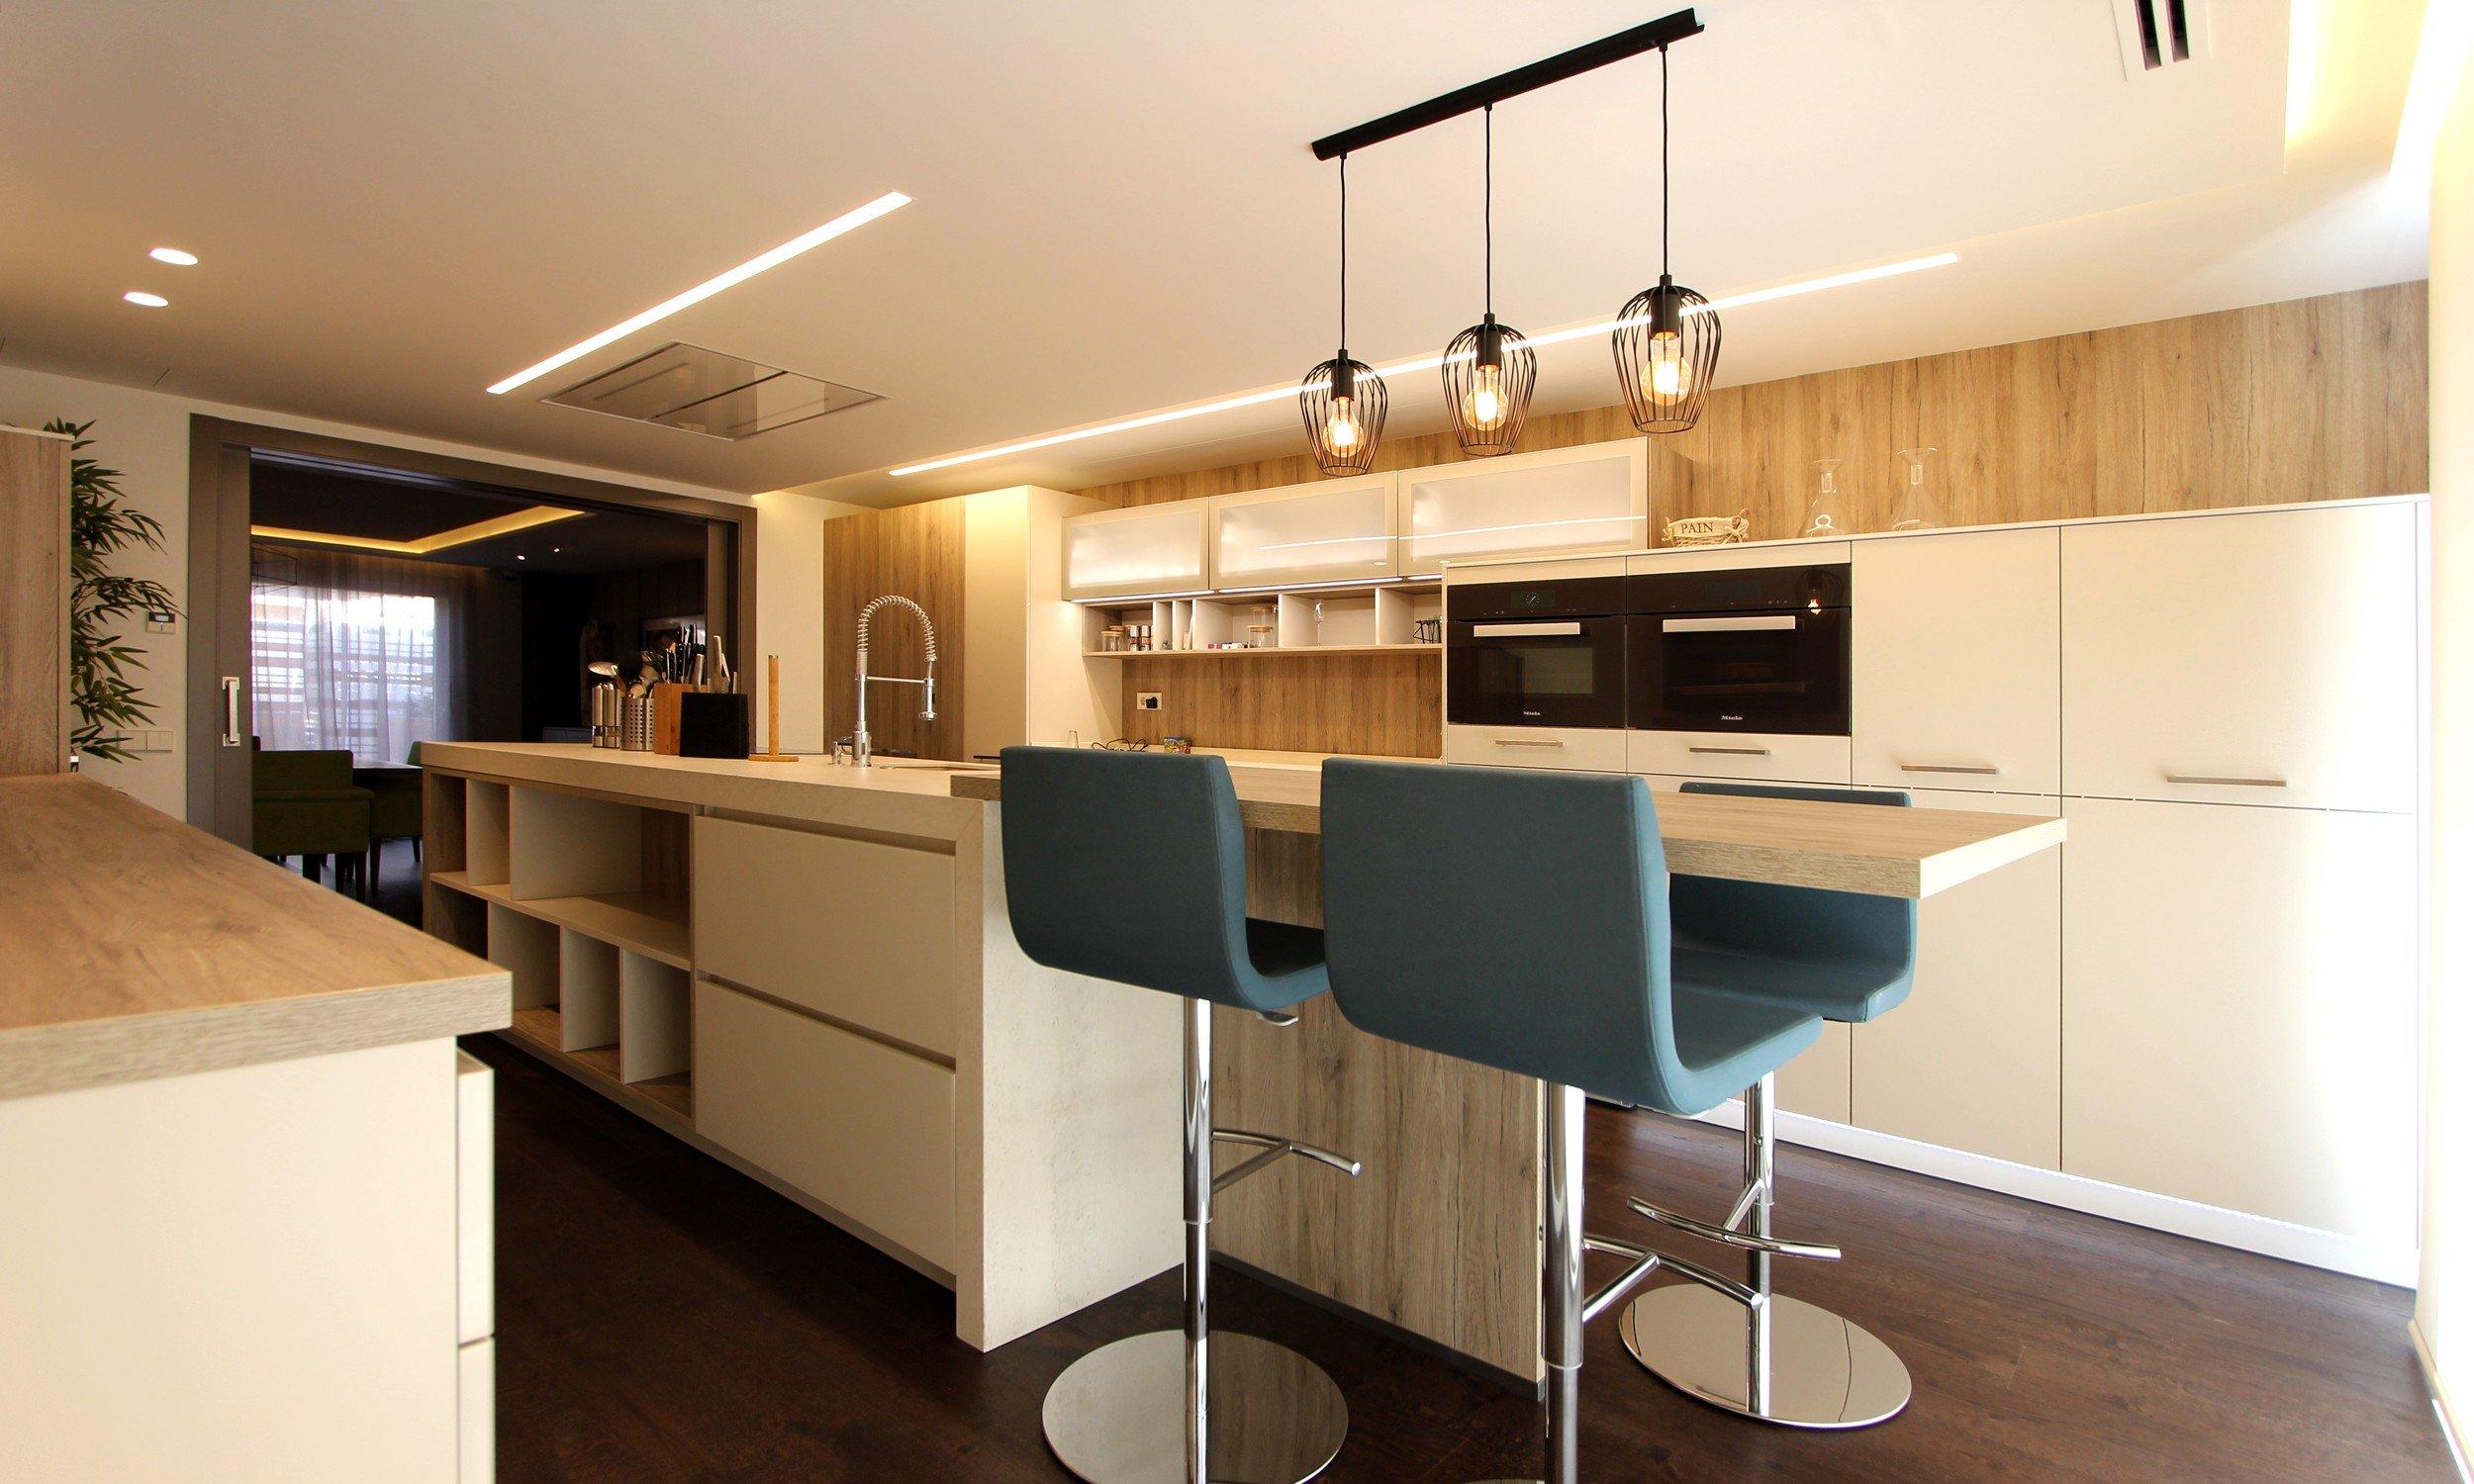 Home d az cano interior design estudio de for Estudios de interiorismo valencia